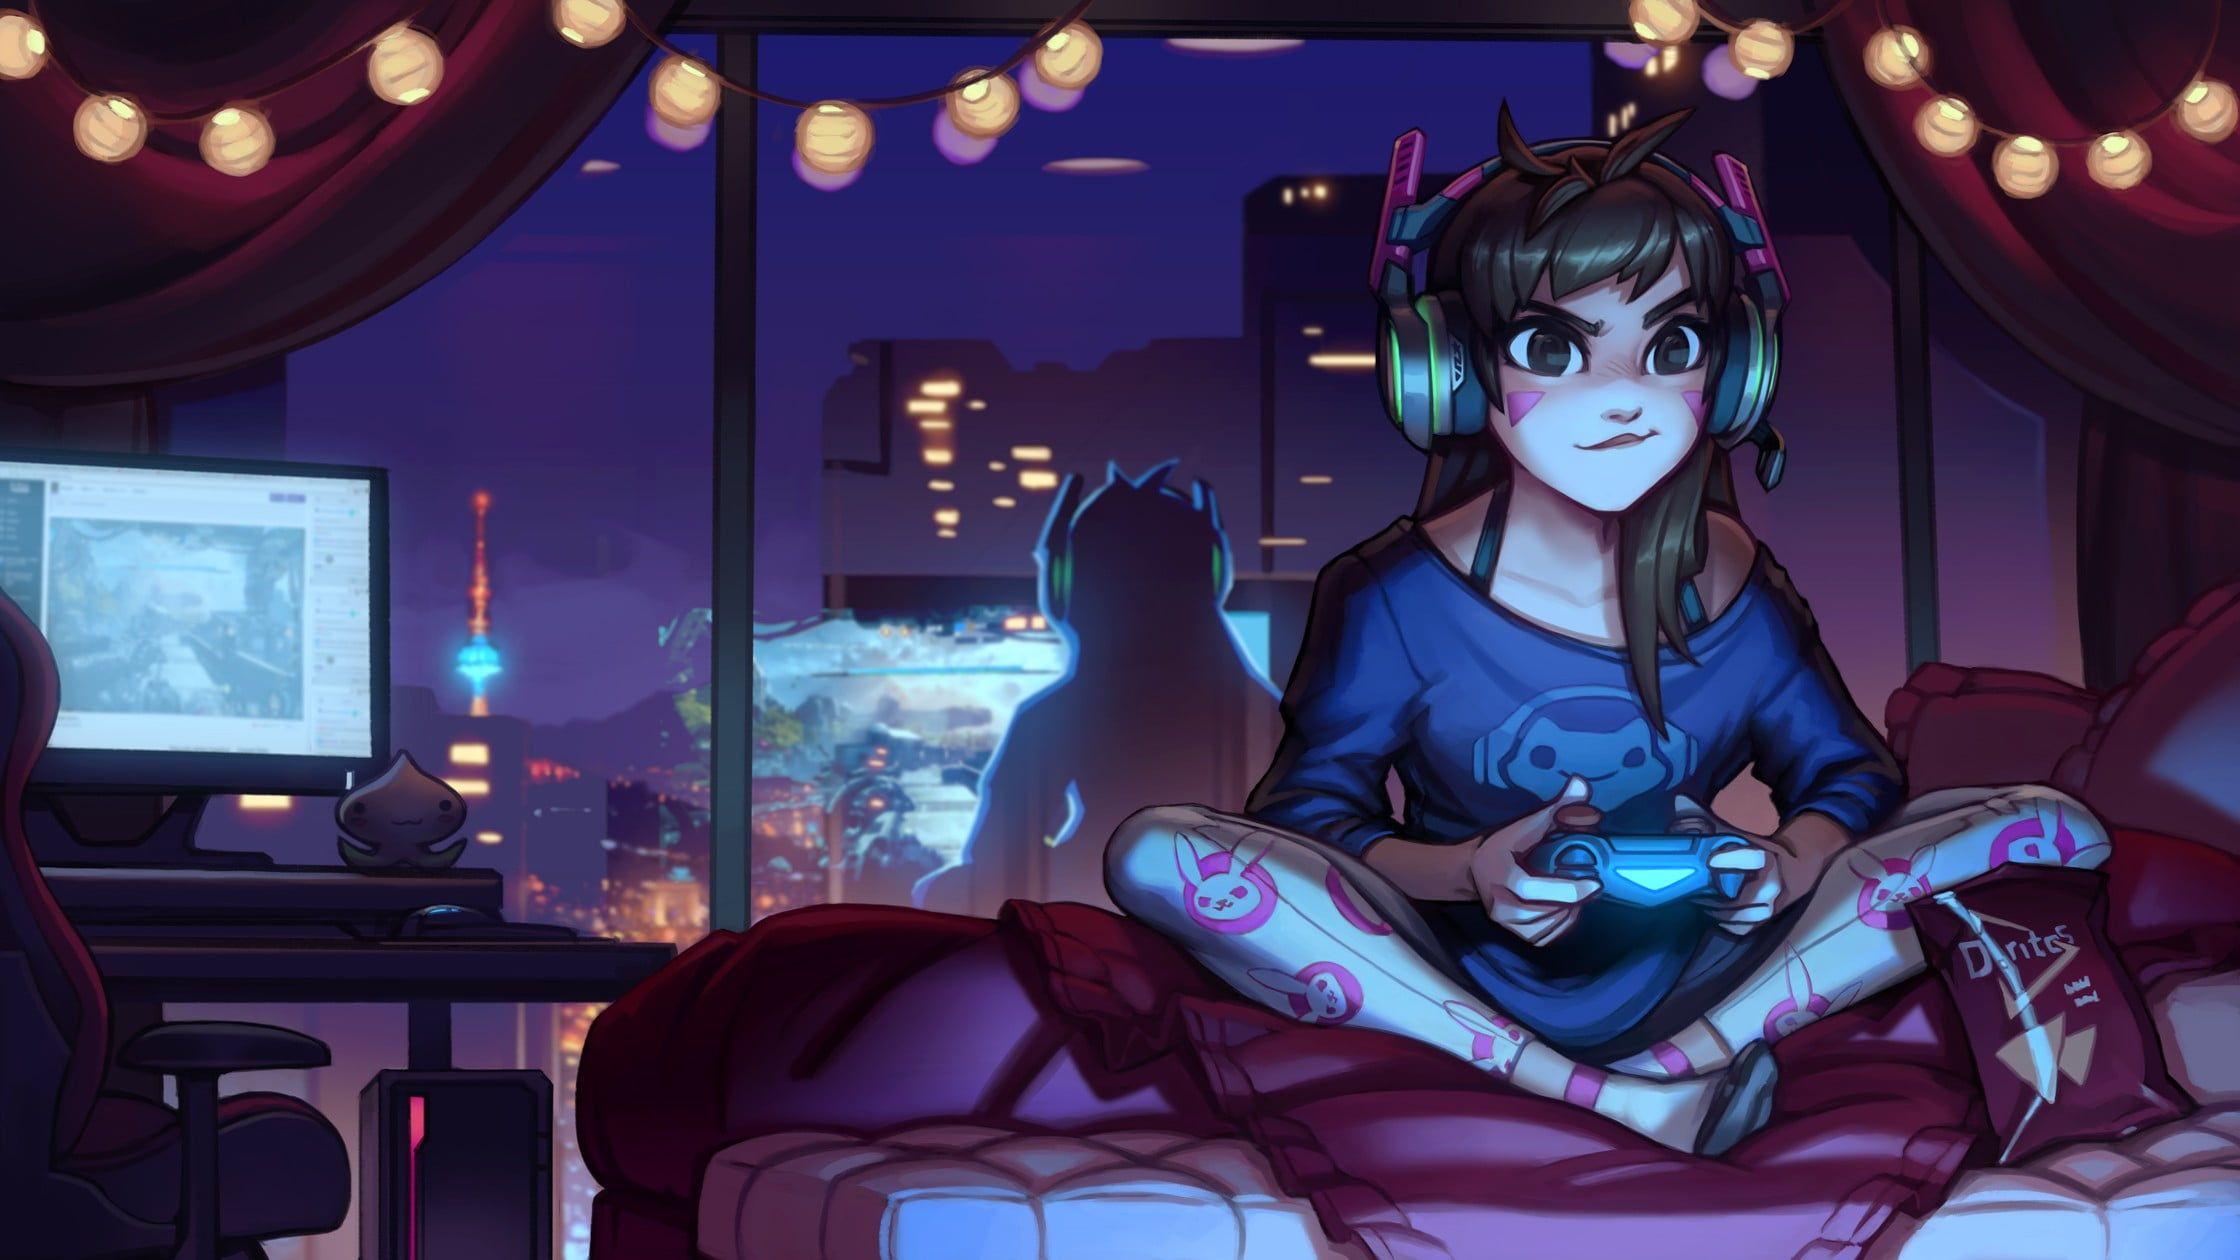 Girl Sitting On Bed Holding Game Controller Illustration